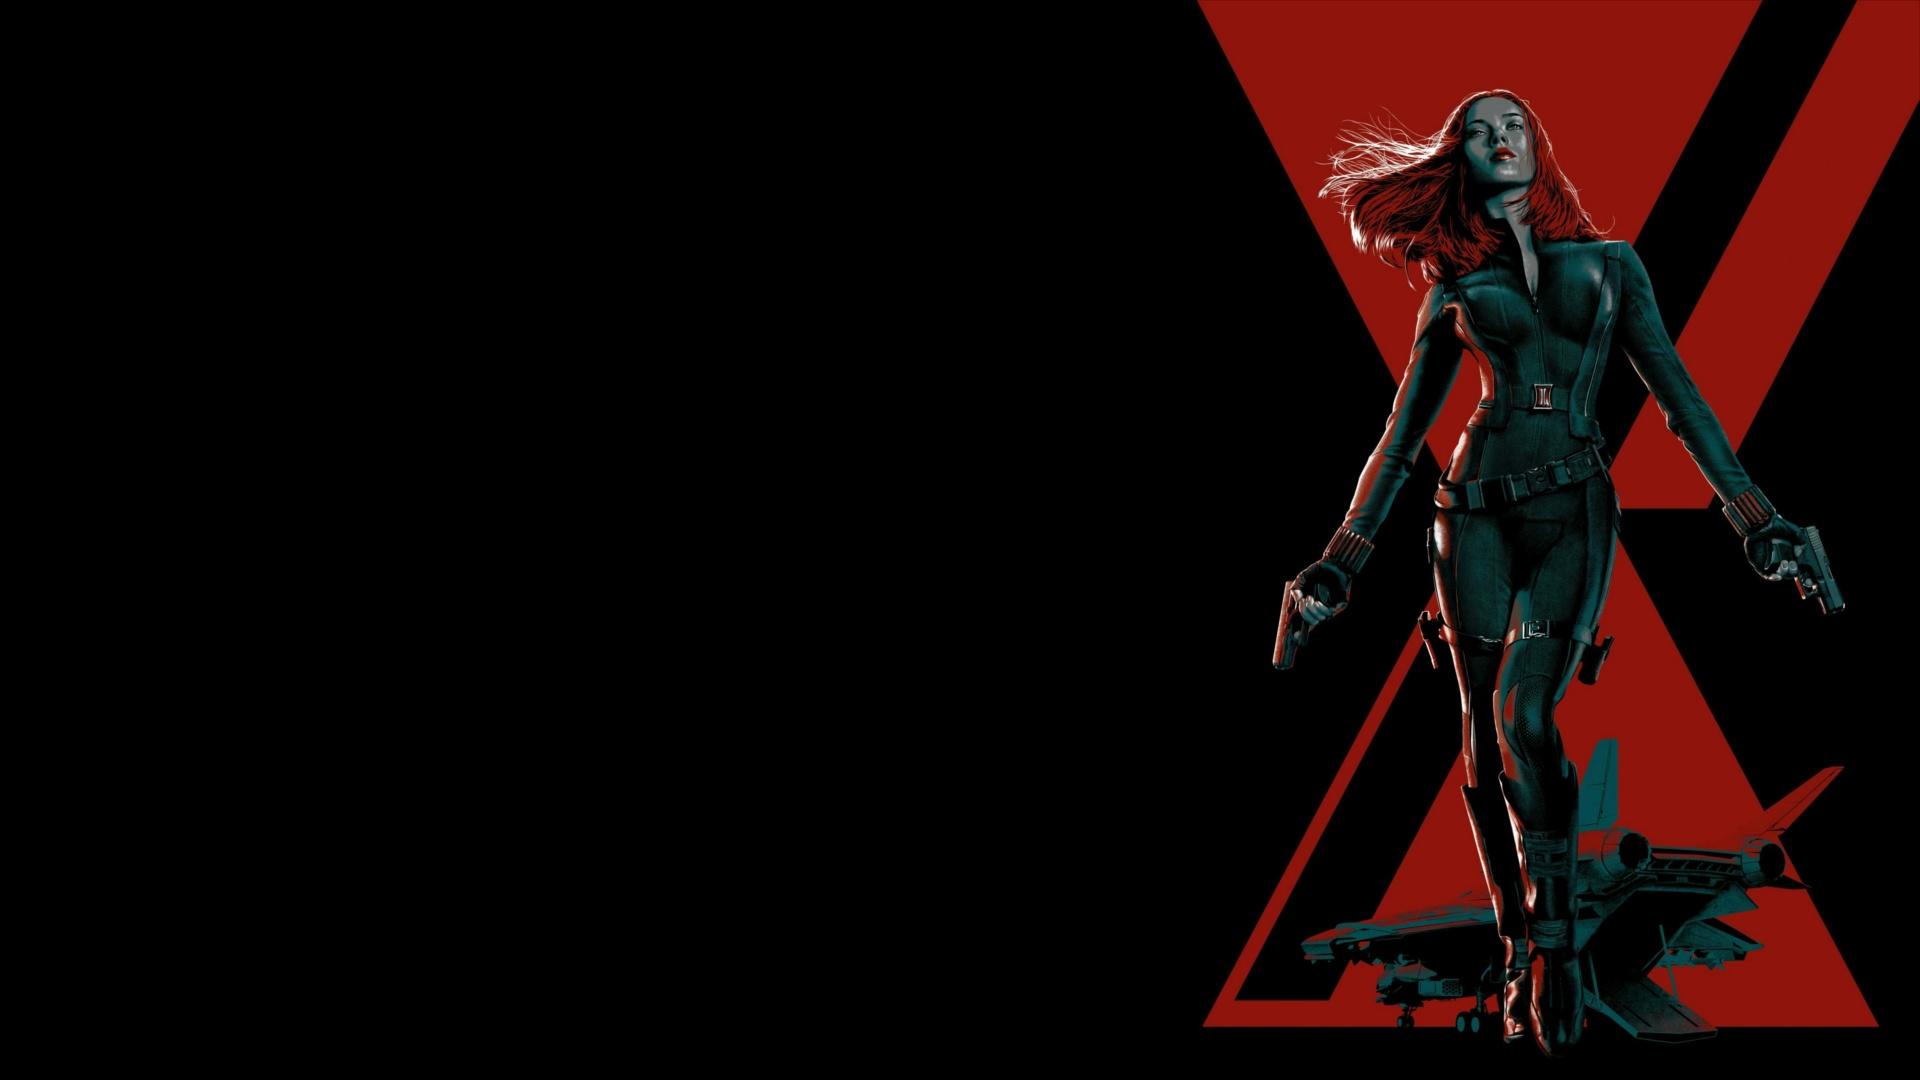 Black Widow hd background